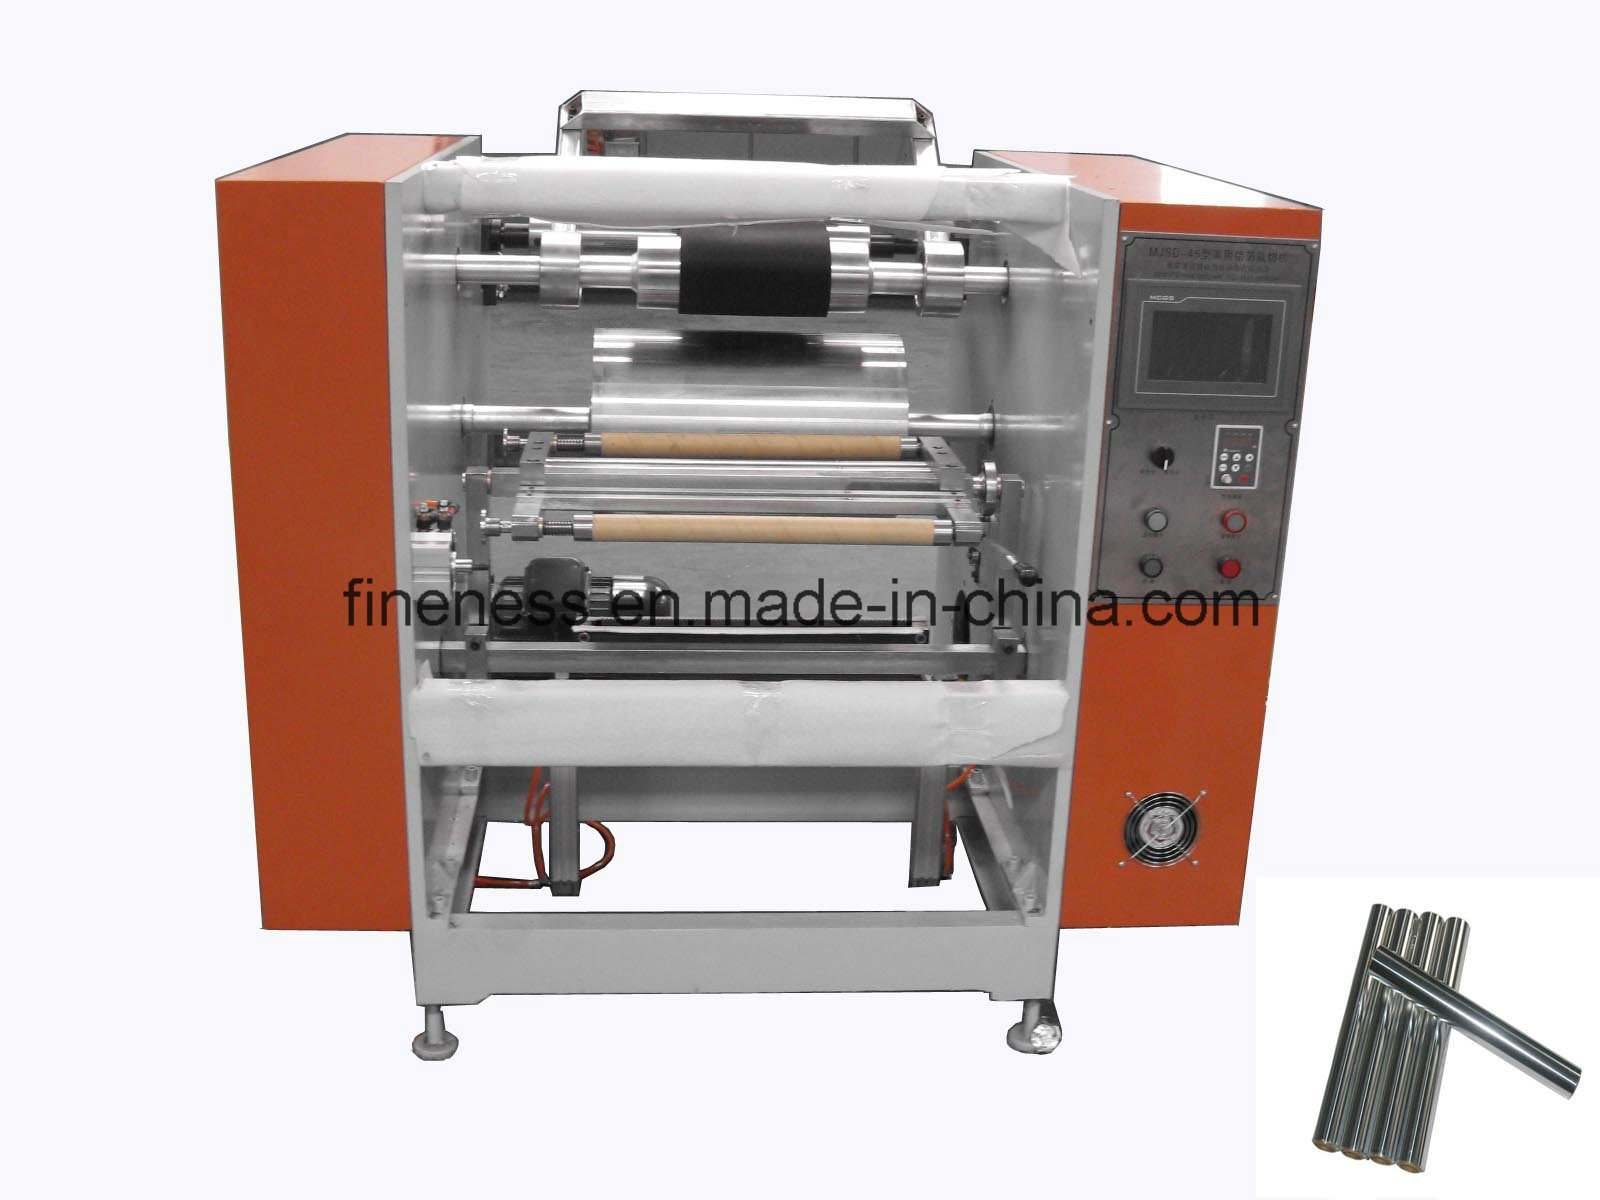 Aluminum Foil Rewinding and Slitting Machine